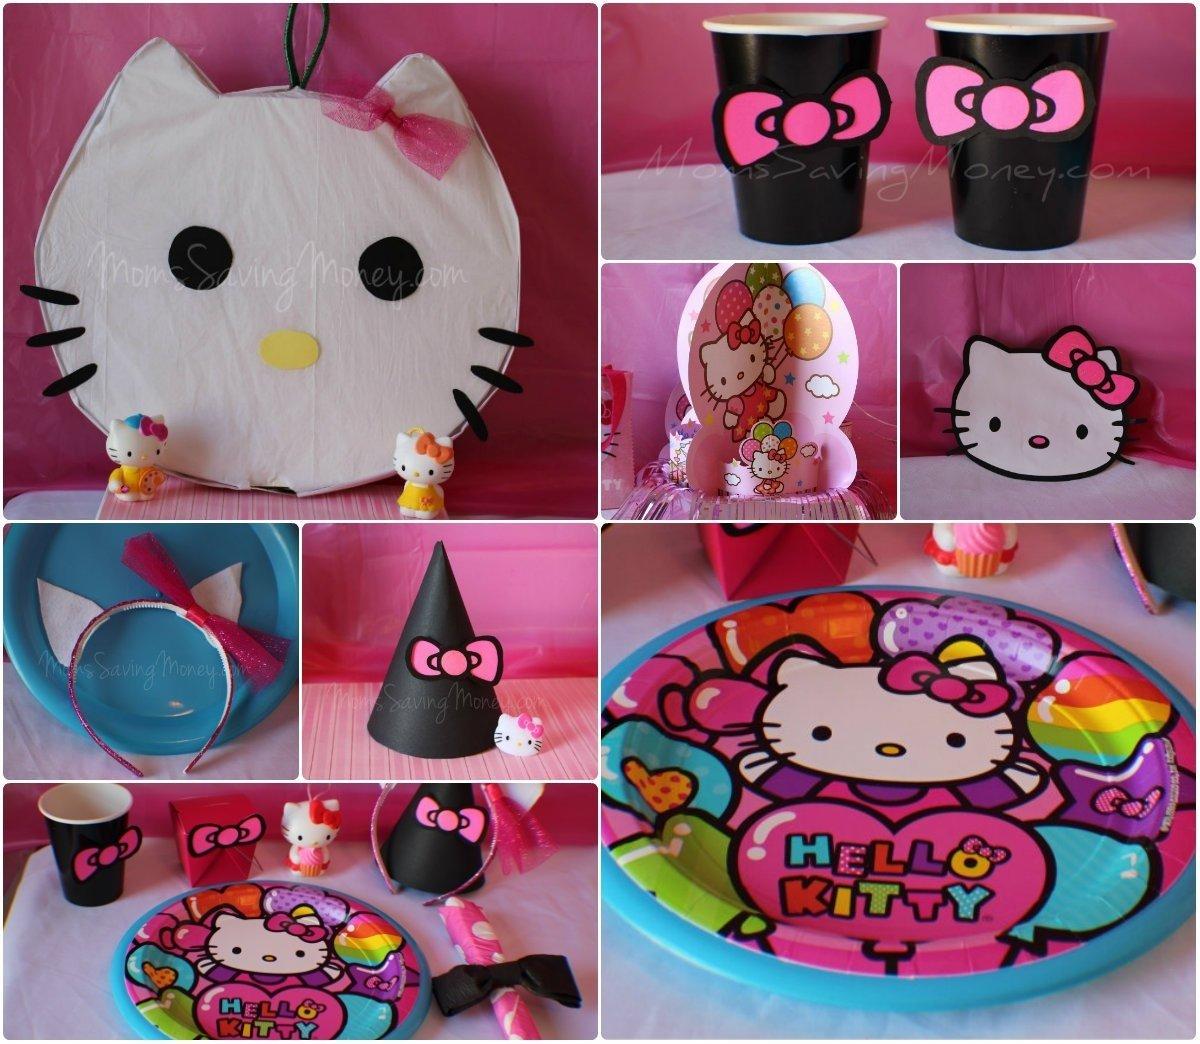 10 Lovable Hello Kitty Party Favor Ideas hello kitty party ideas rebecca autry creations 3 2020